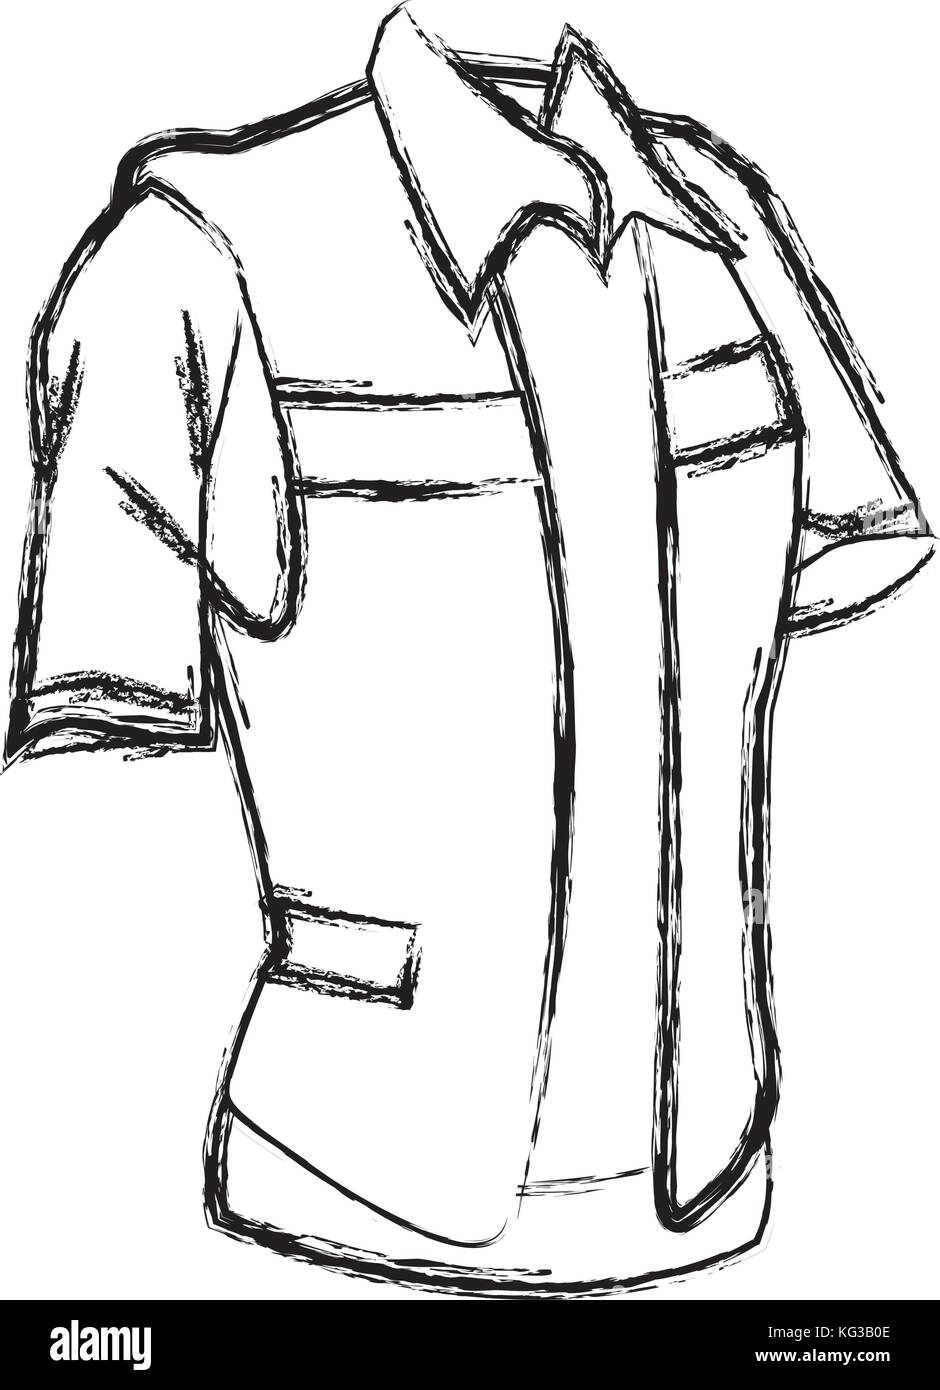 Construction worker vest - Stock Image